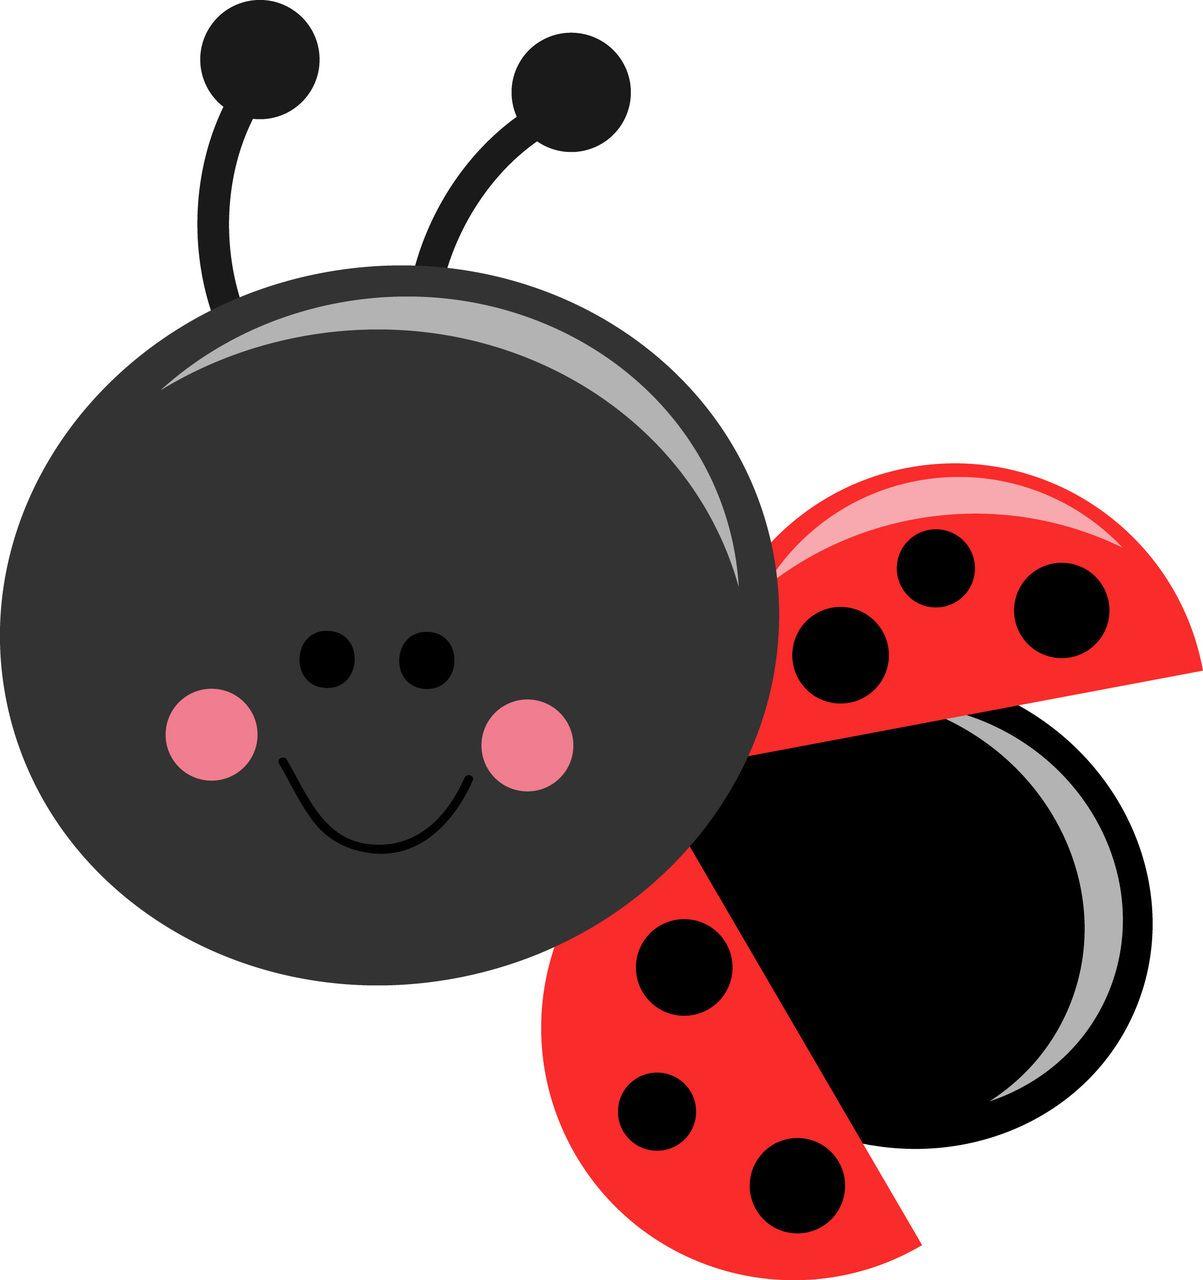 Coccinelle | Etiquetas | Pinterest | Ladybug, Clip art and Baby ladybug